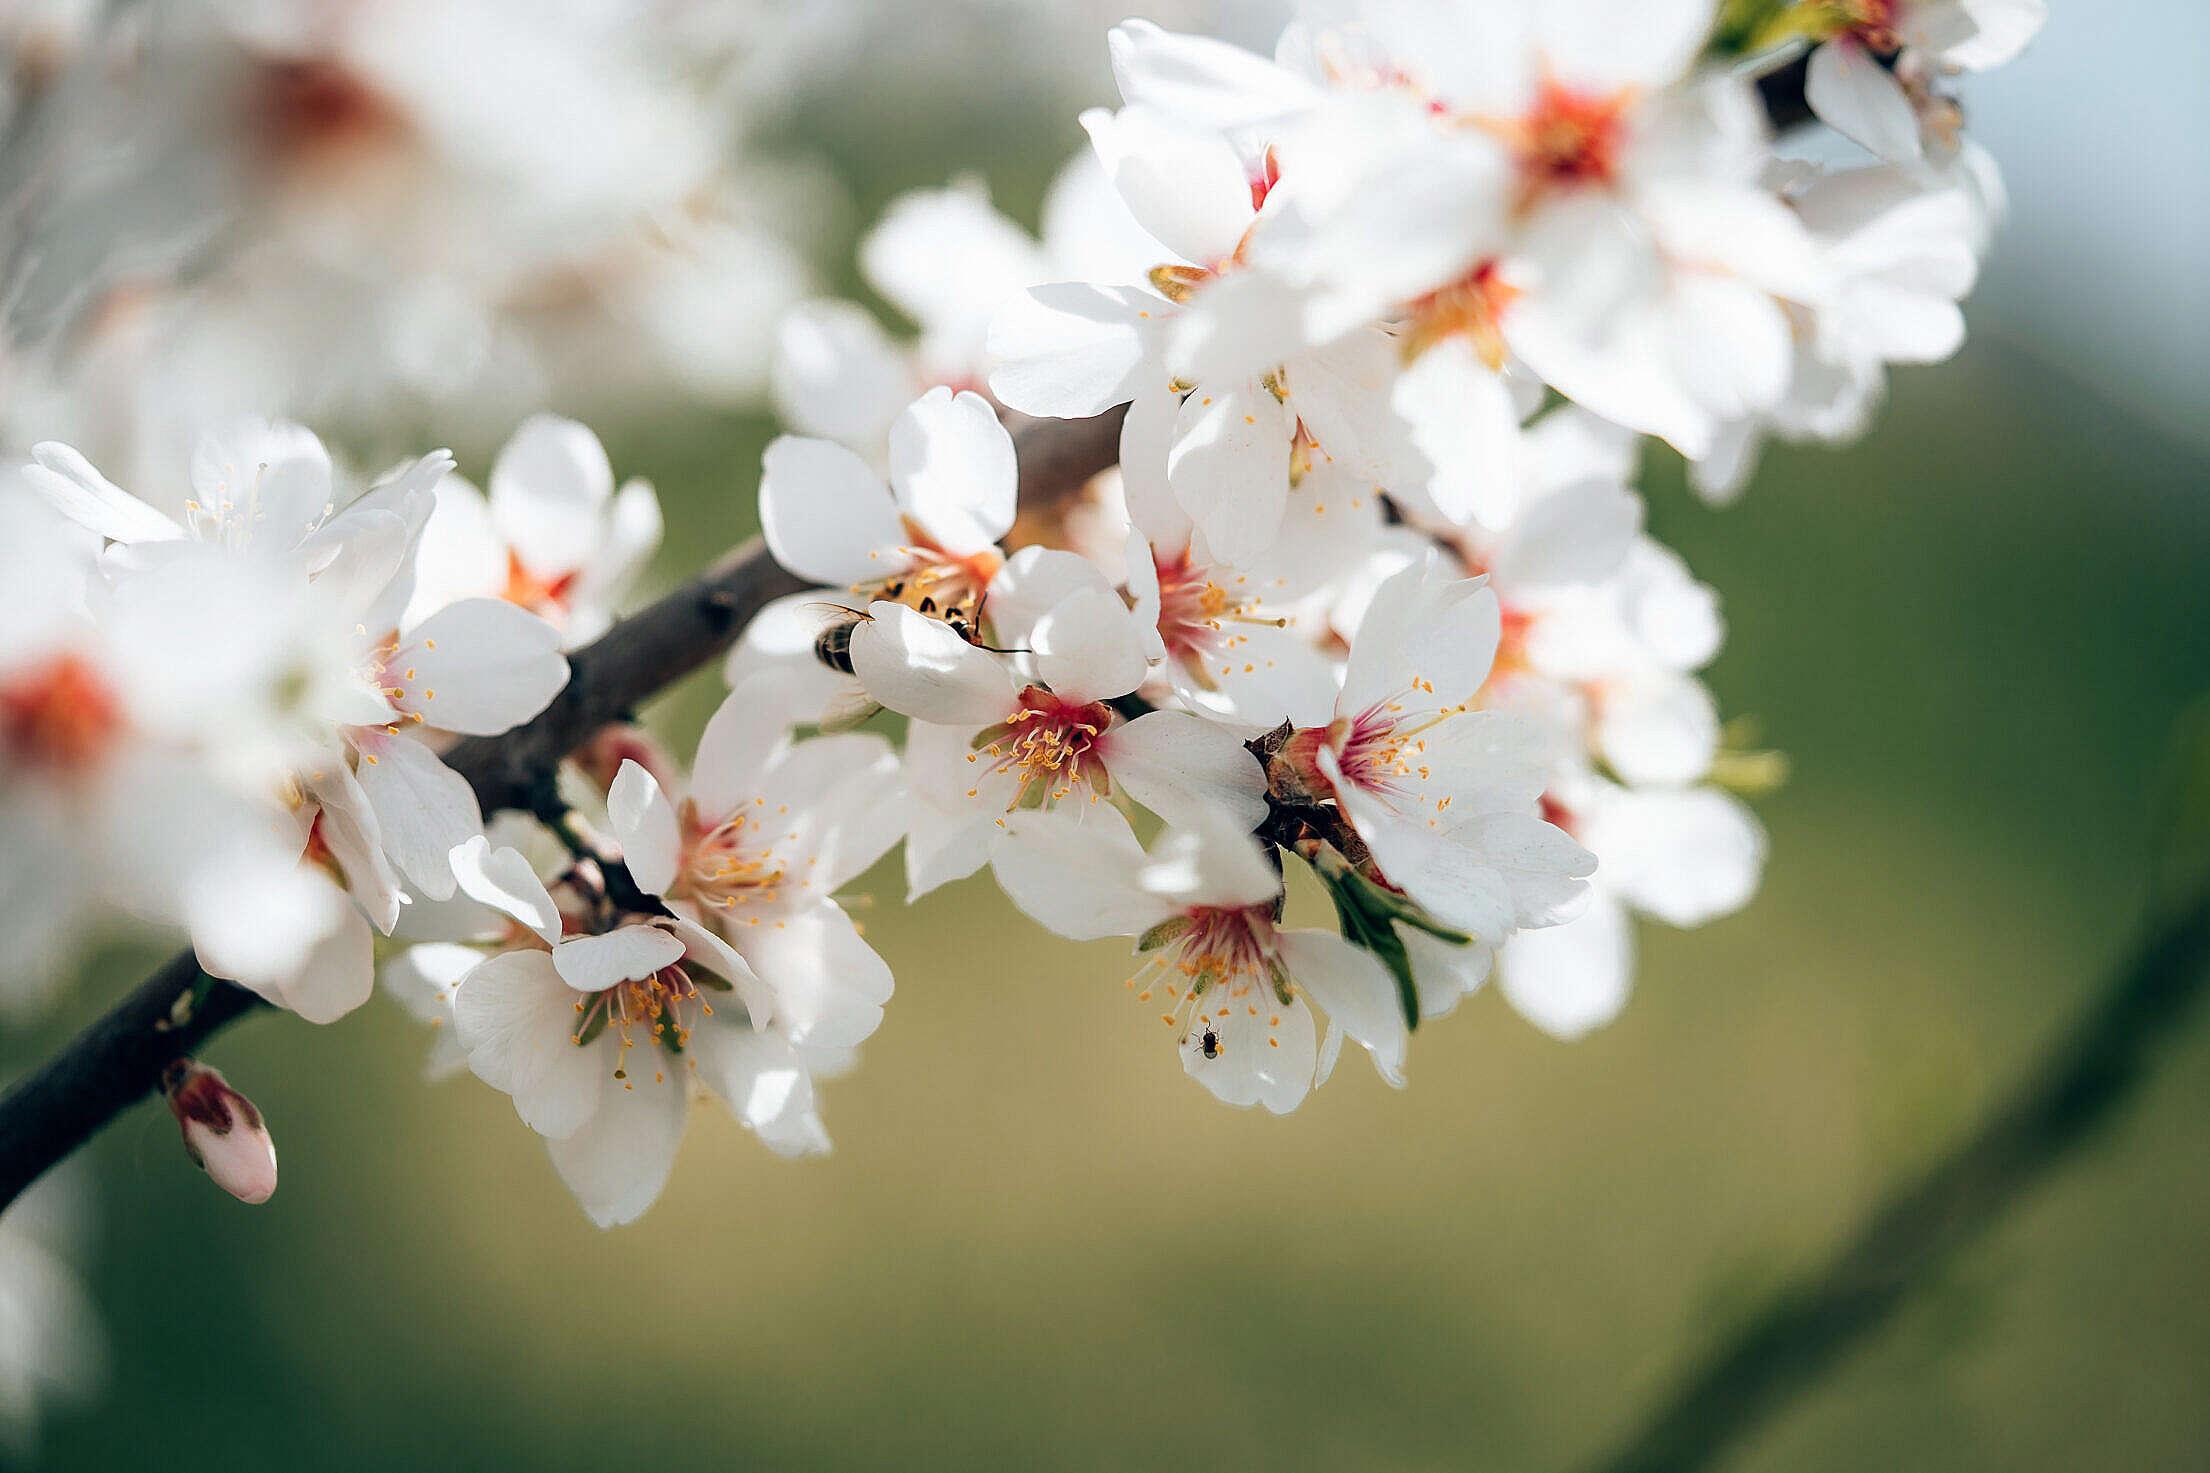 Almond Tree Blossoms Free Stock Photo